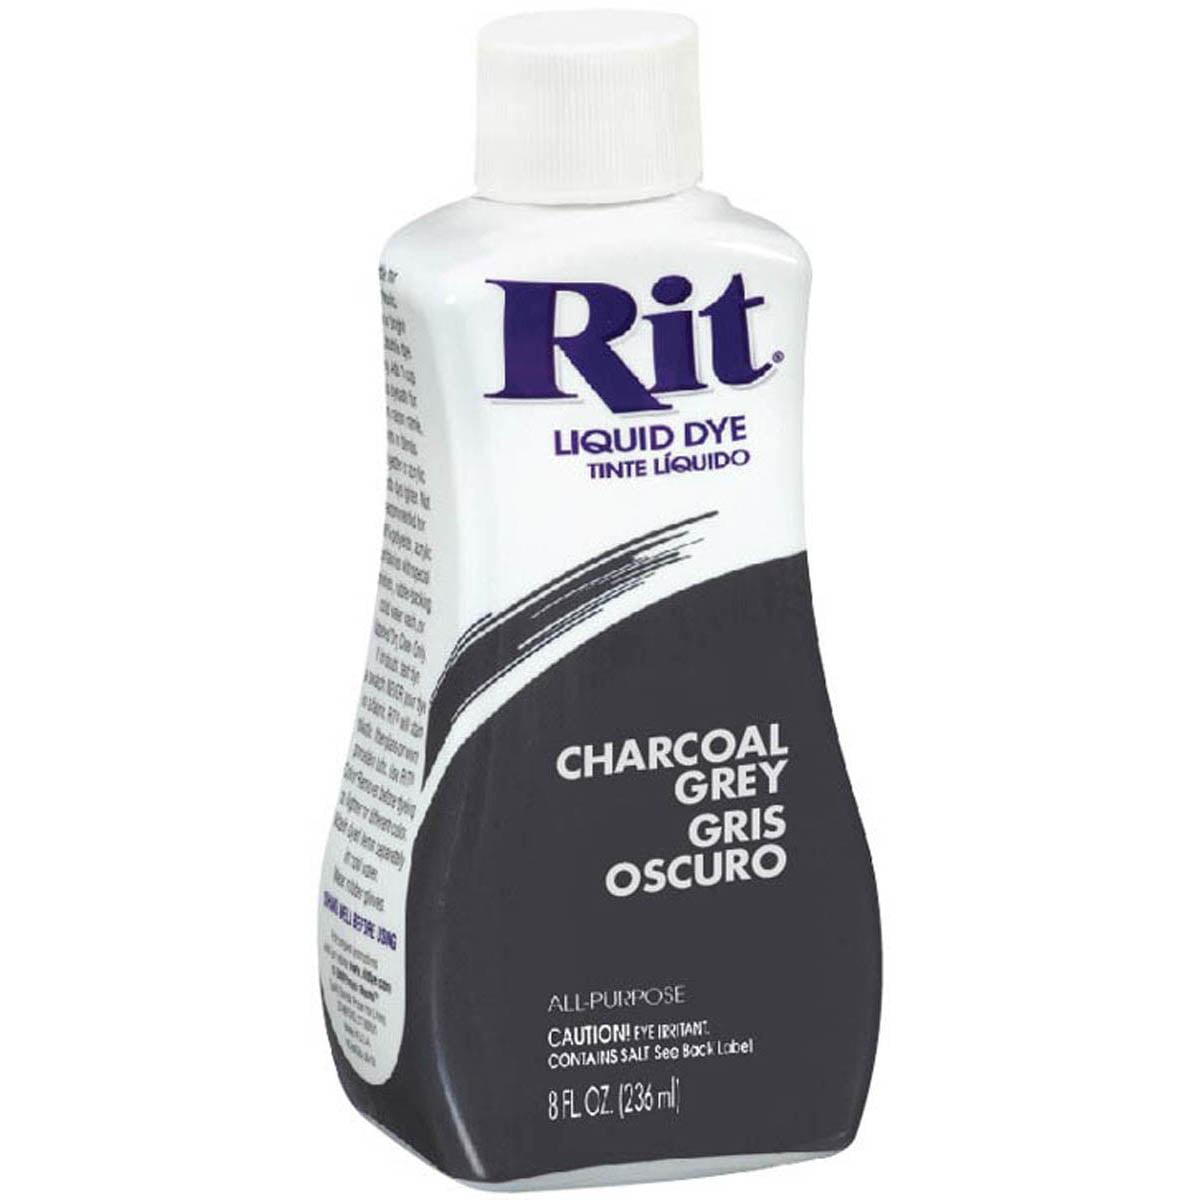 Rit Dye Liquid 8oz Charcoal Grey